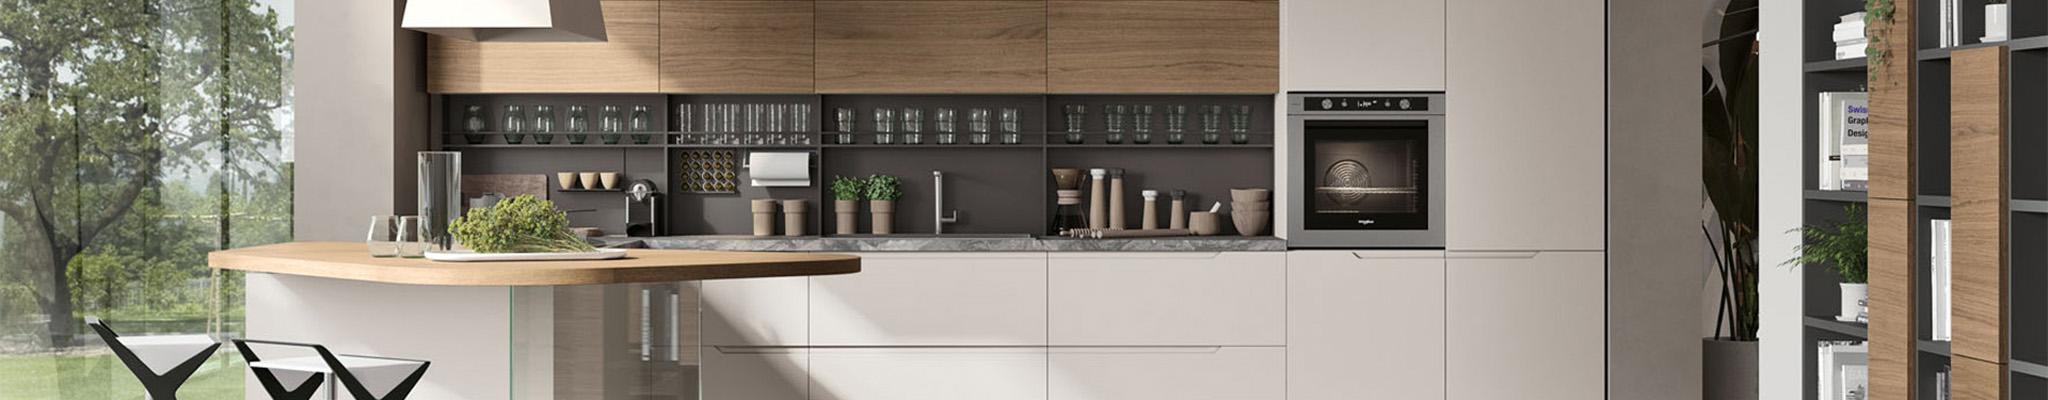 Ama Cucine Firenze collezione creo kitchens genova - cucina e dintorni